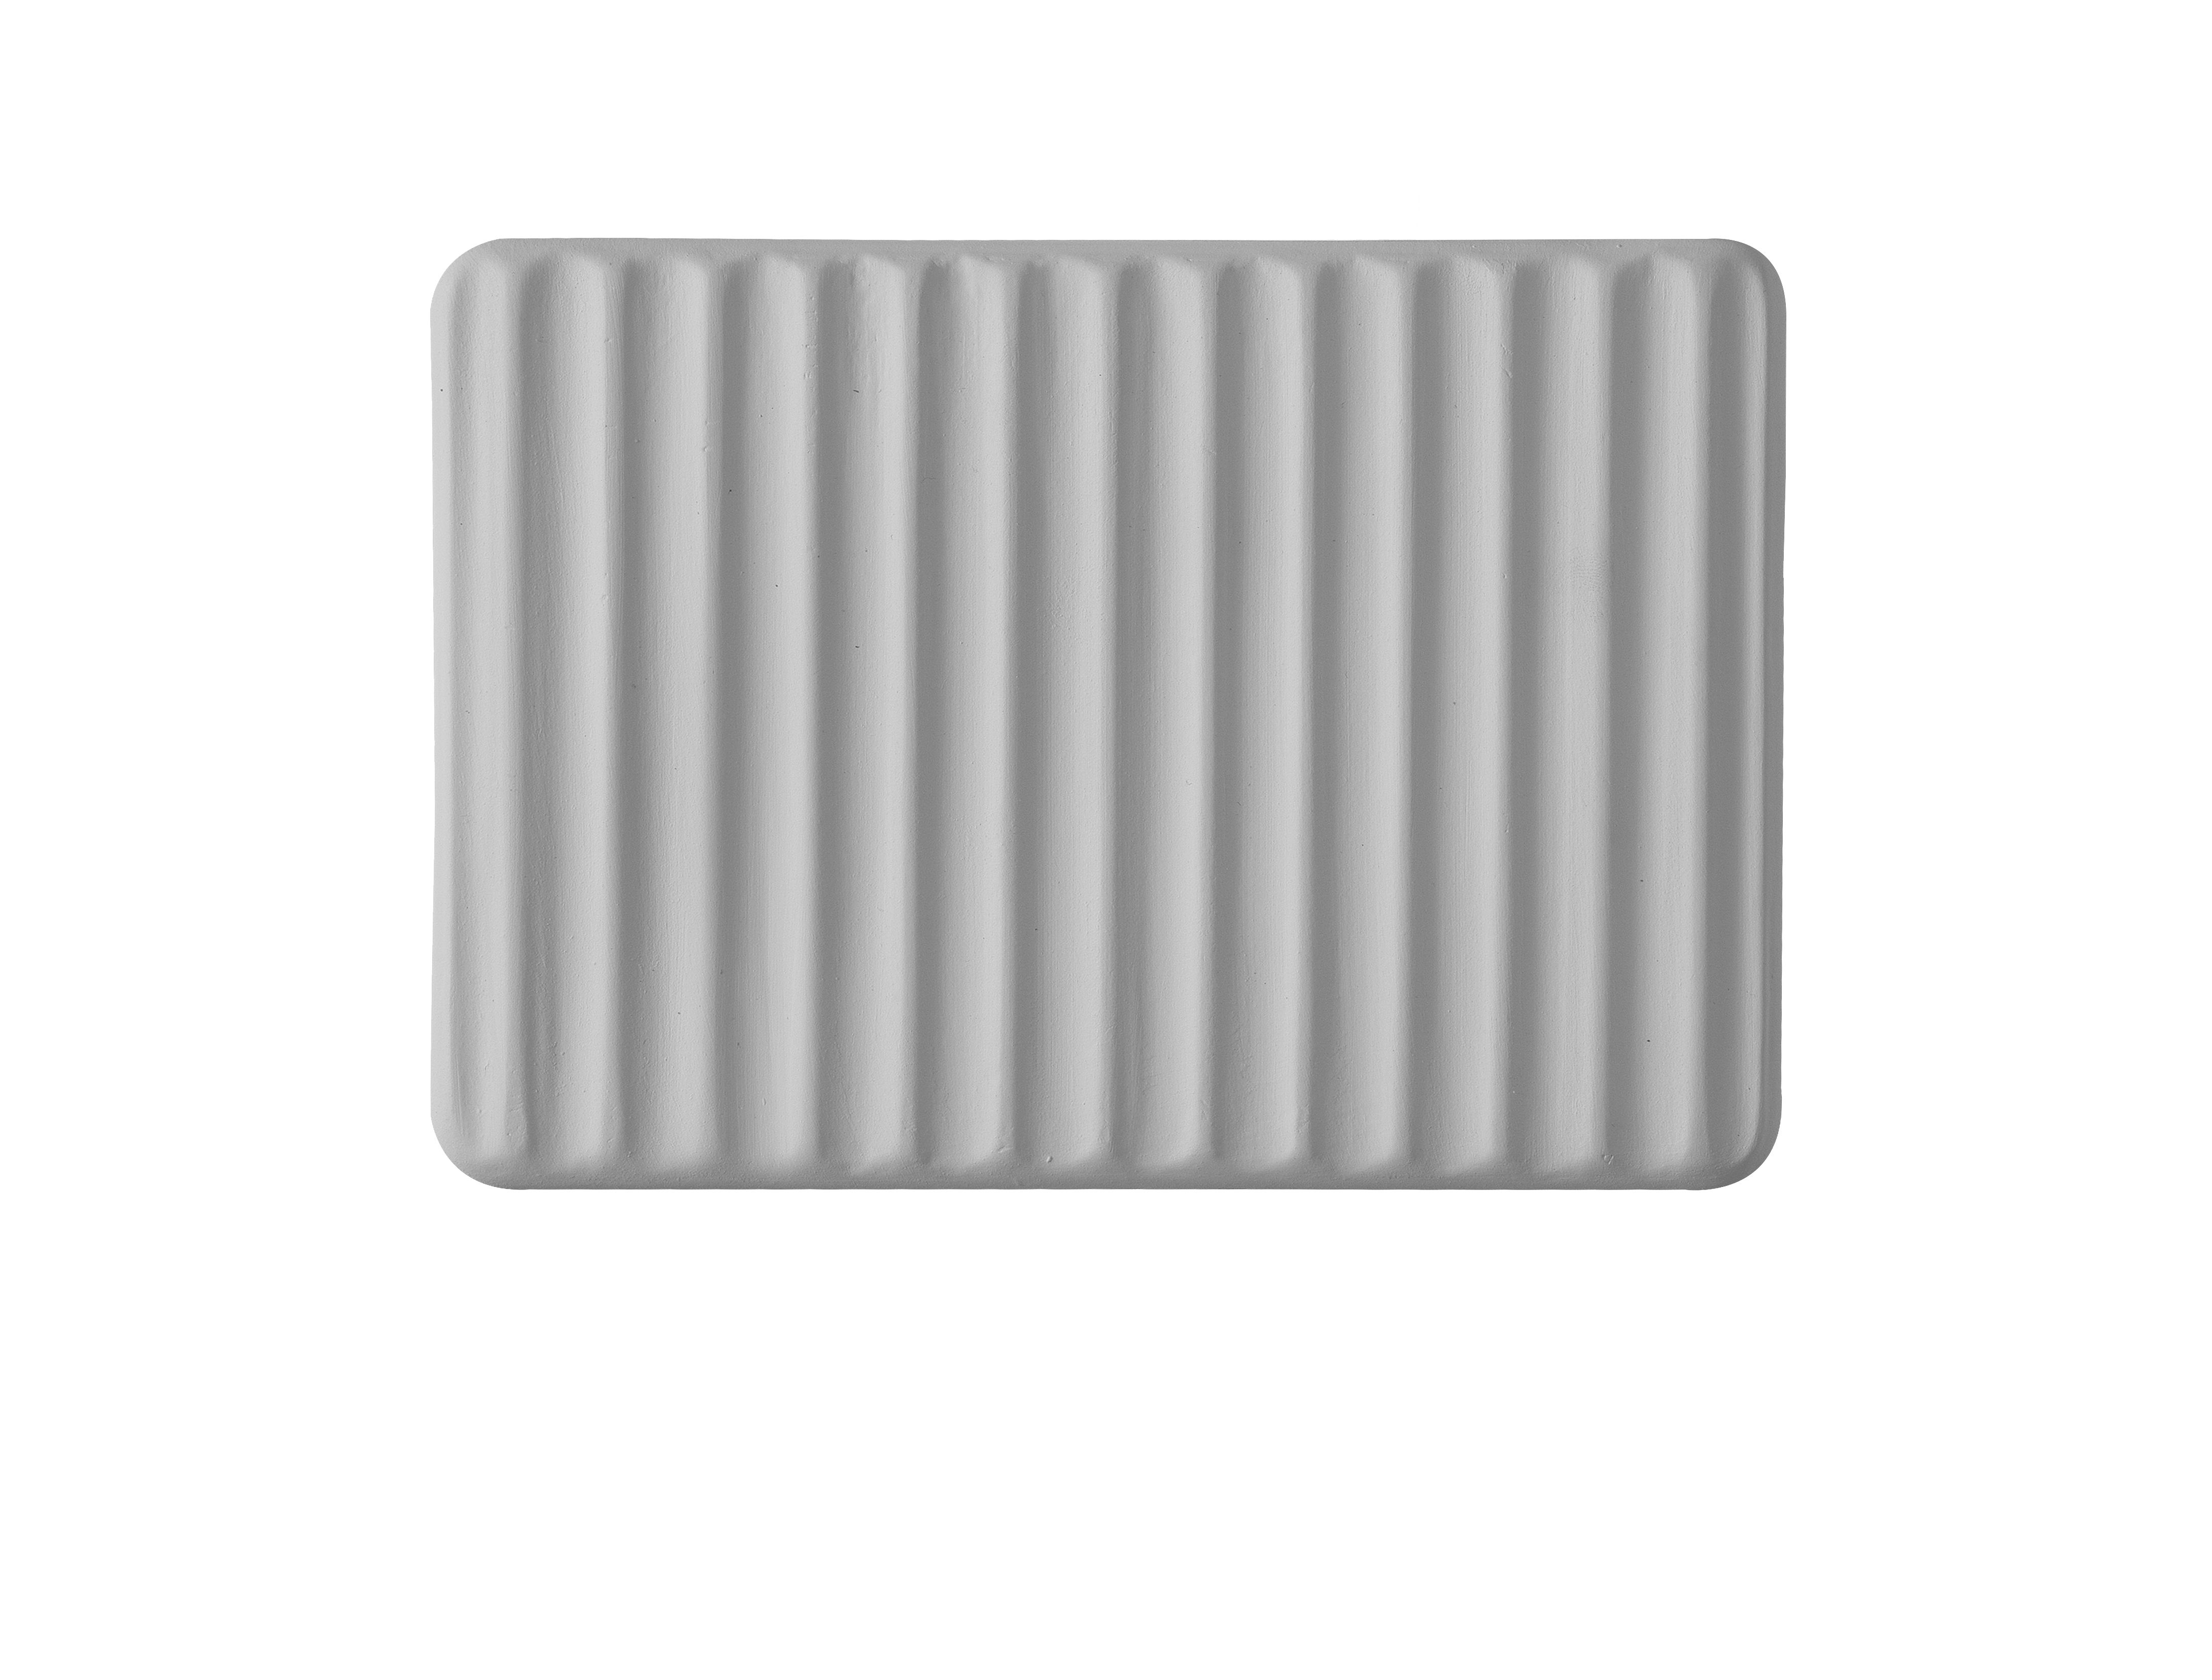 Leuchten - Wandleuchten - Umarell LED Wandleuchte / Keramik - L 18 x H 13 cm - Karman - Wandleuchte / Weiß - Keramik